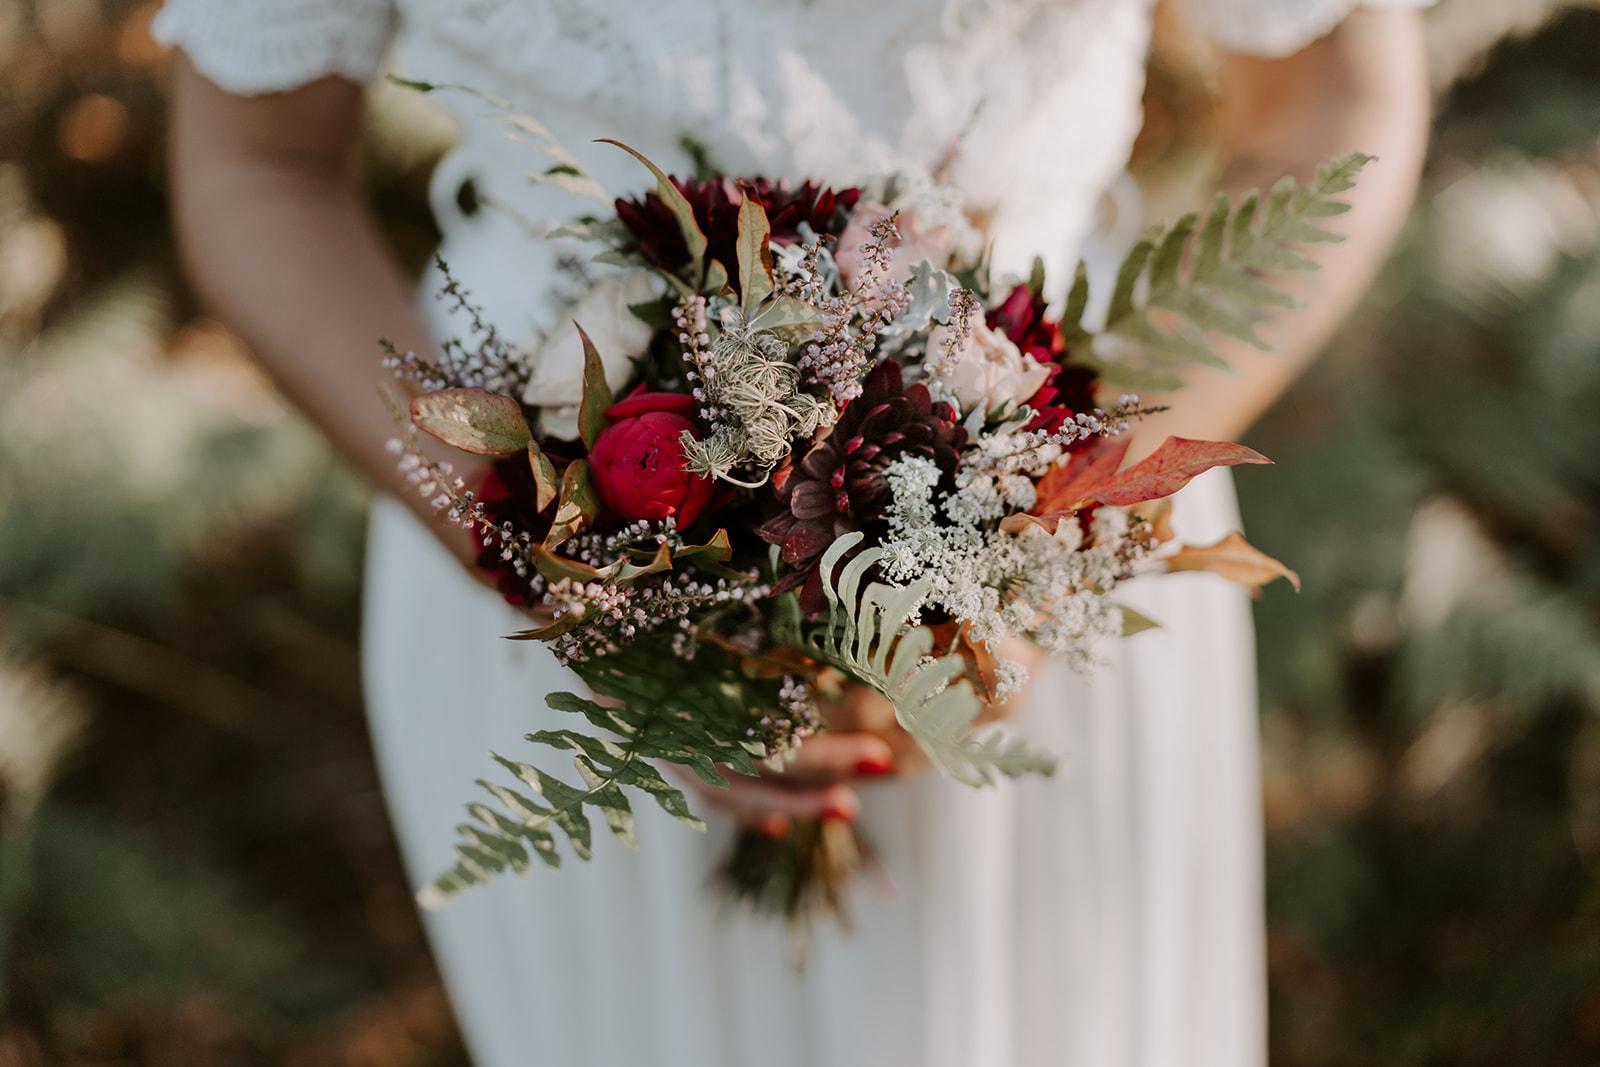 elsacaza_photographe_lebci_fleuriste_mariage_lebci_fleuriste_bordeaux